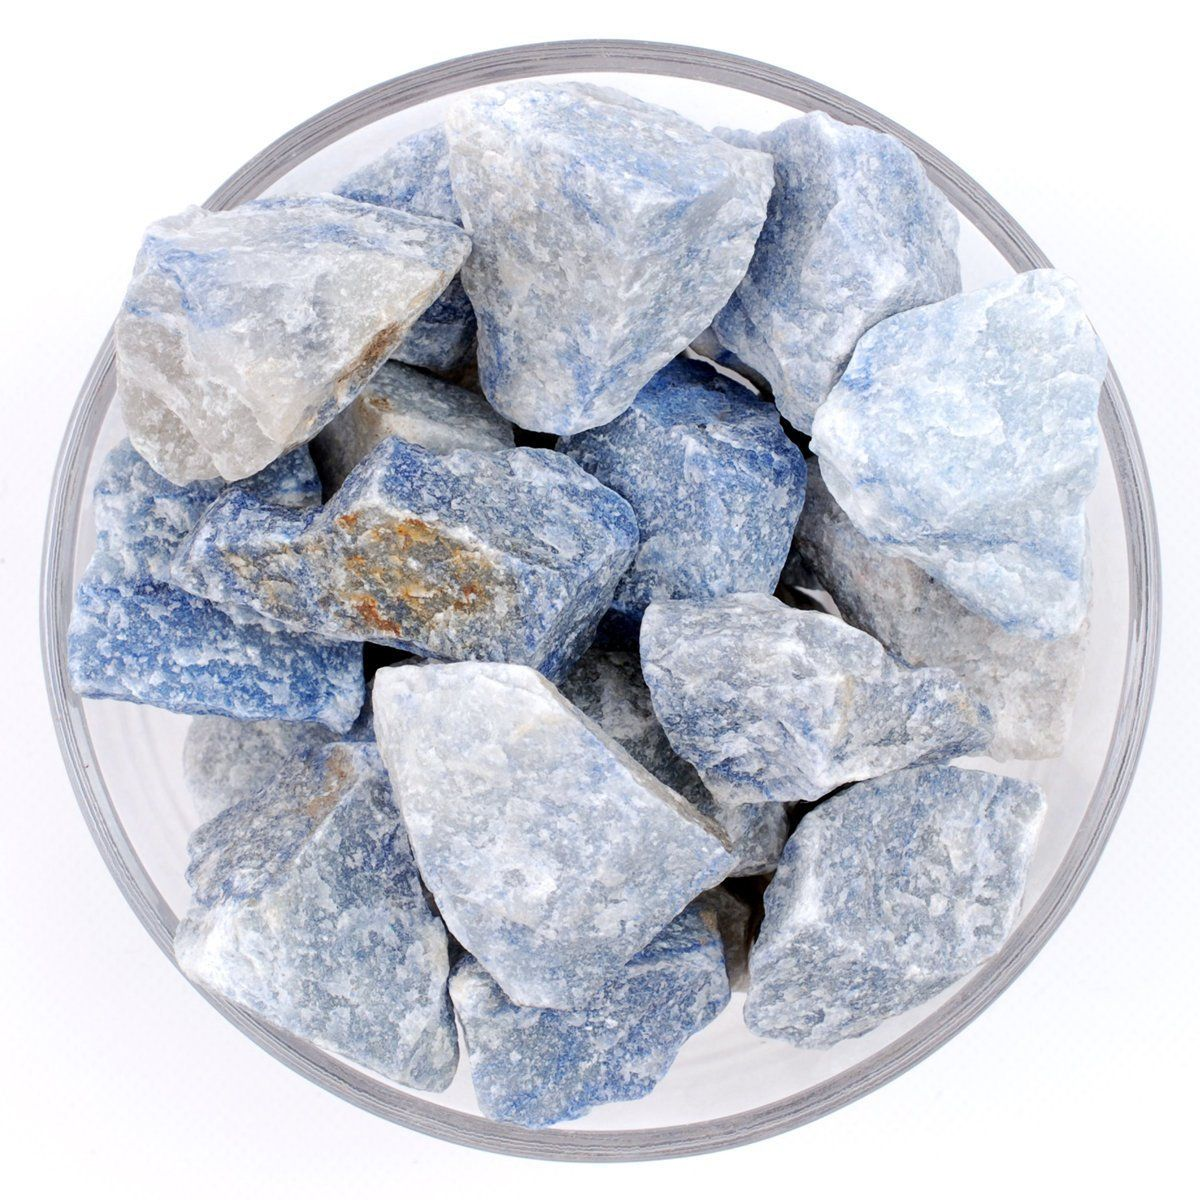 Rough Blue Quartz Rough Blue Quartz Stones Rough Blue Quartz Etsy Blue Quartz Quartz Rock Quartz Stone